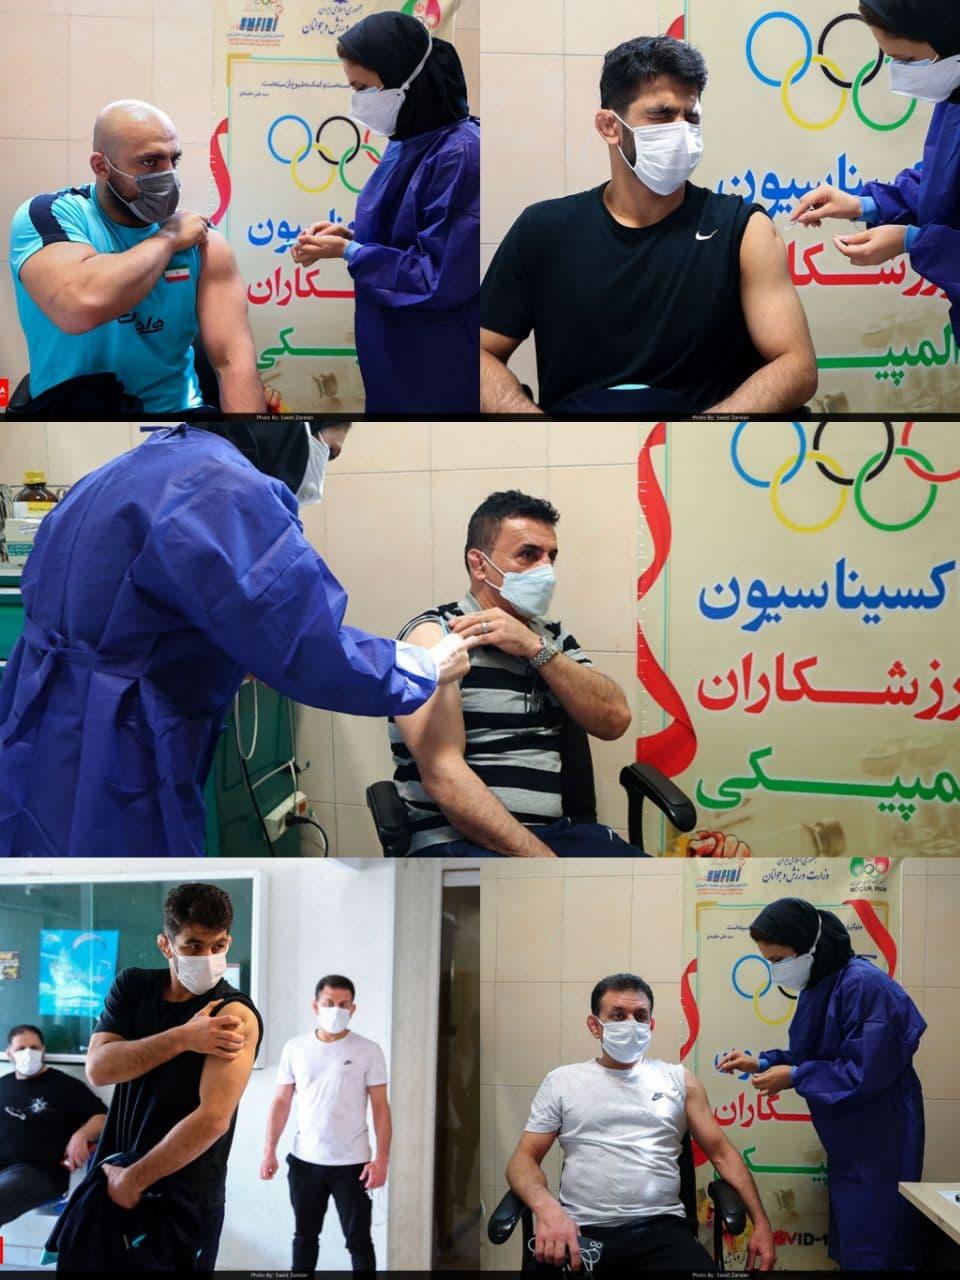 چهره جالب حسن یزدانی هنگام تزریق واکسن/عکس